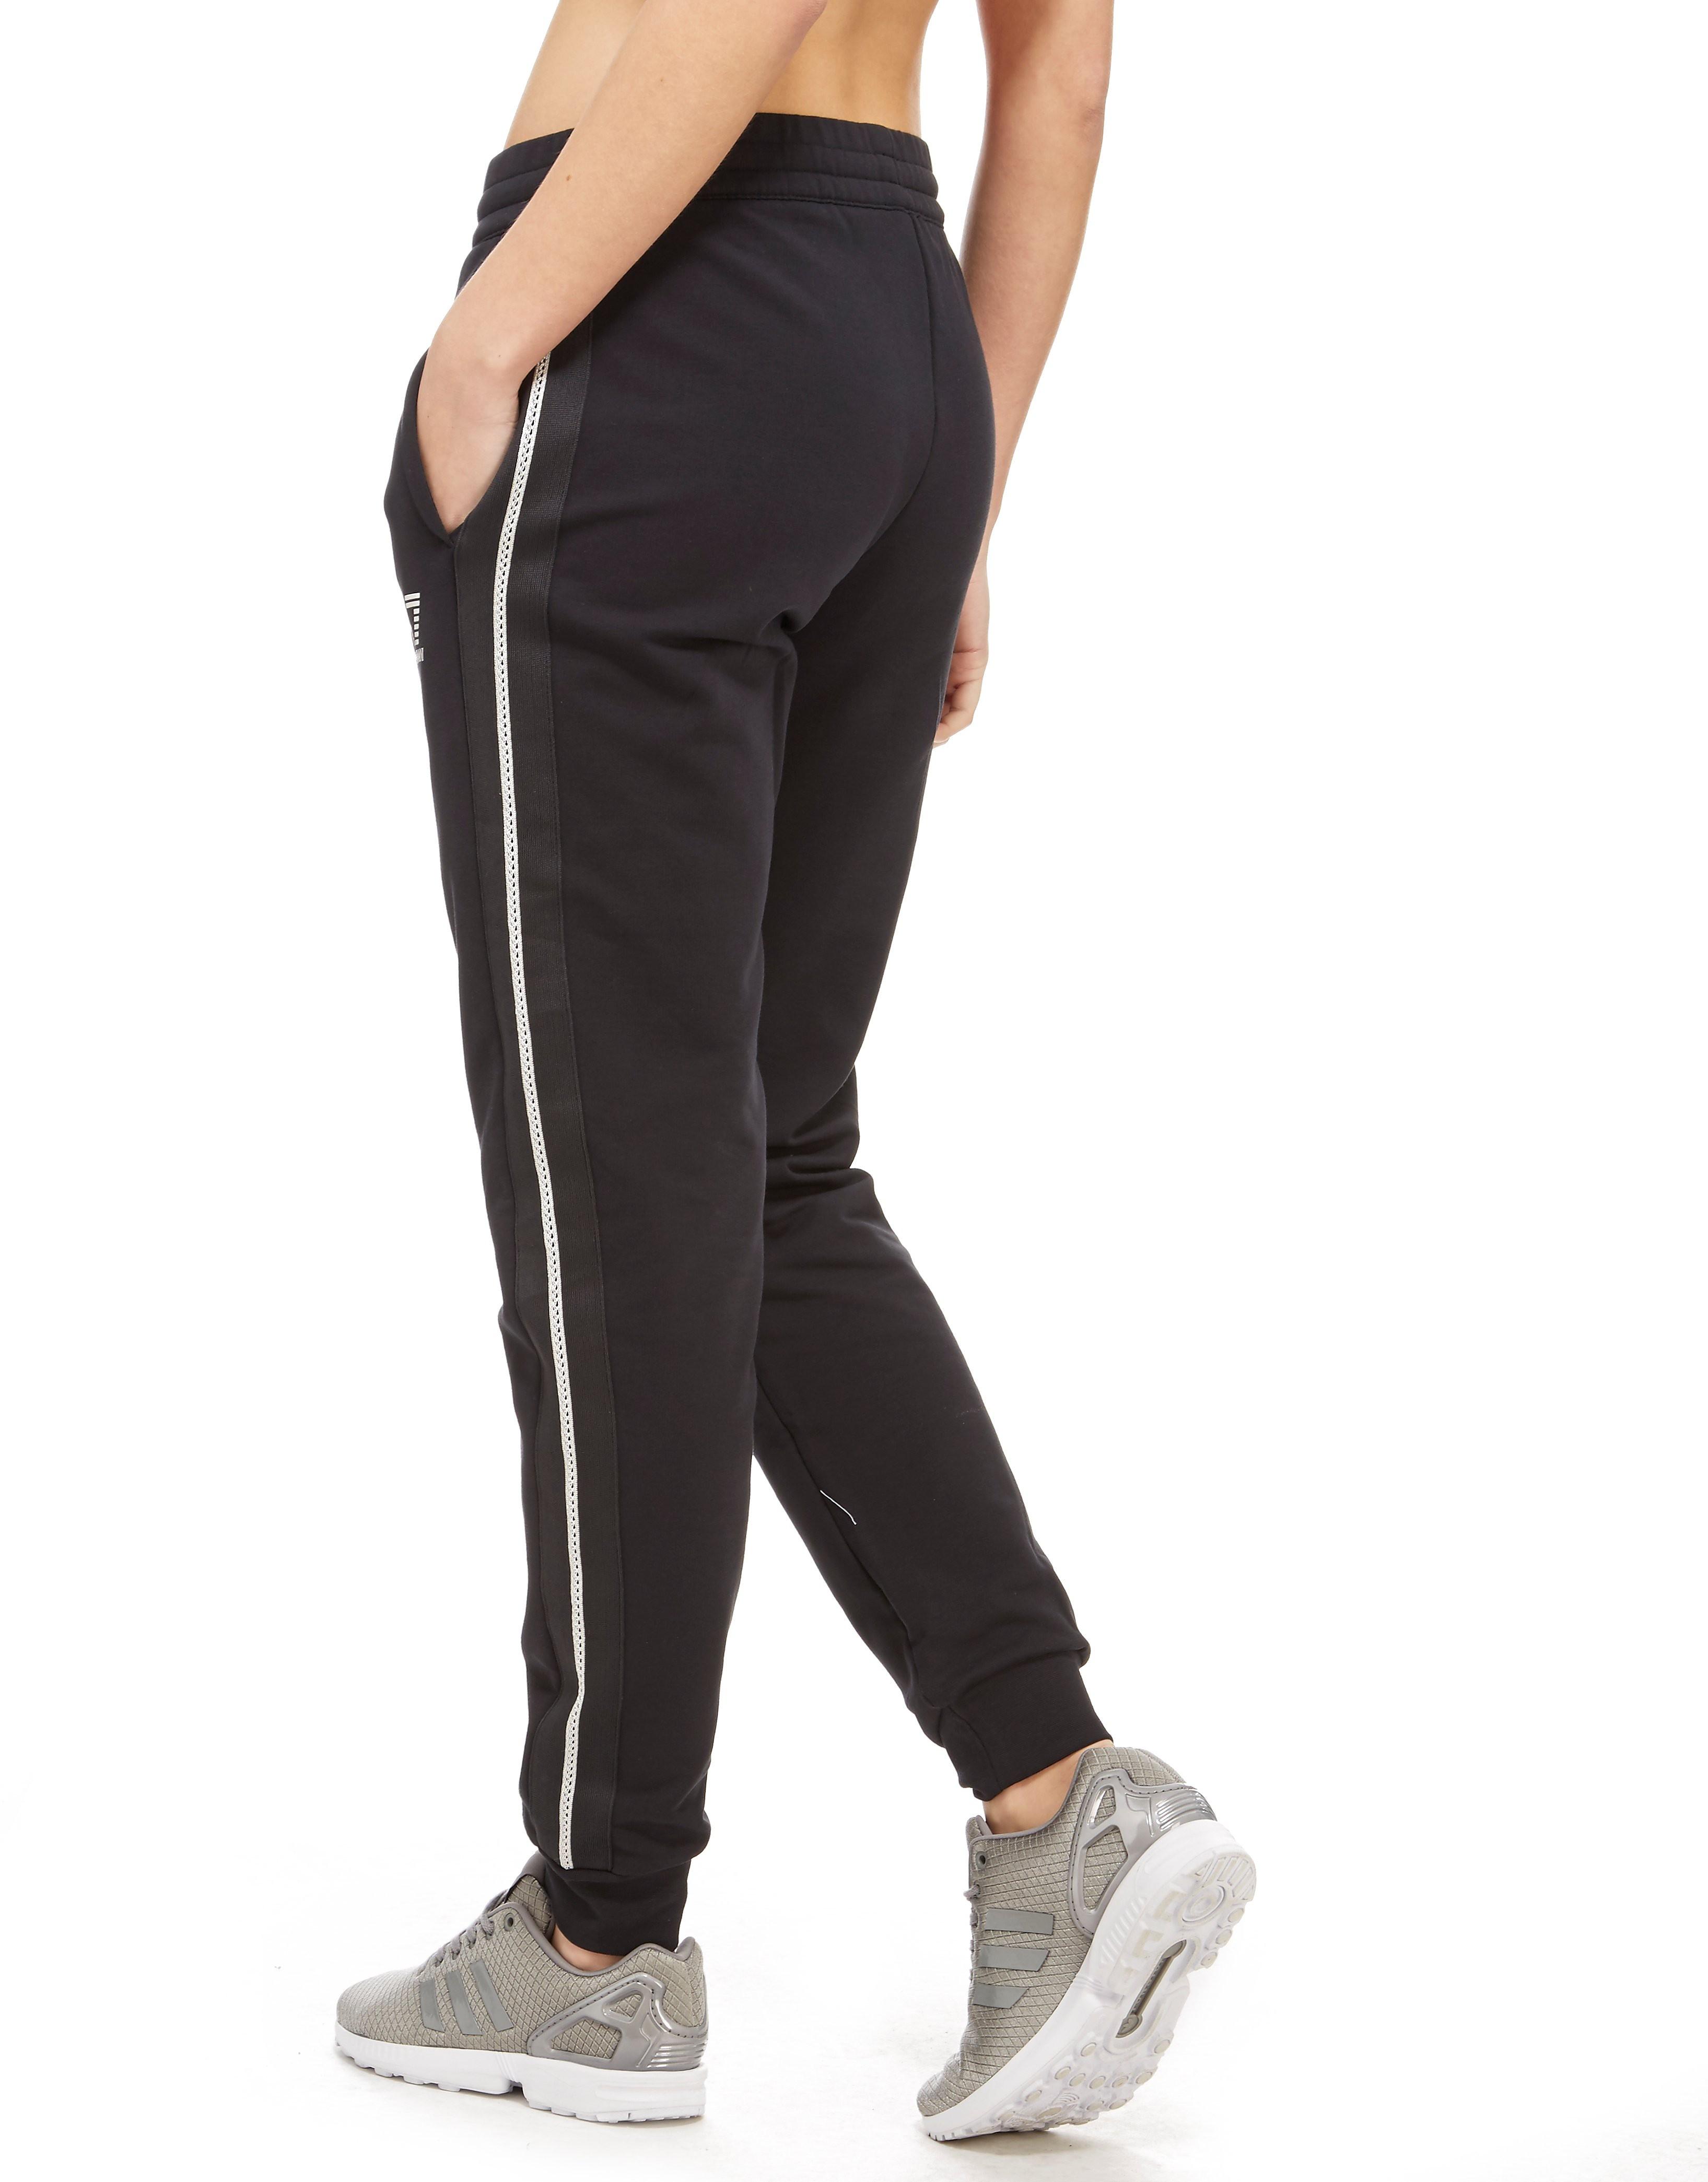 Emporio Armani EA7 Tape Fleece Pants